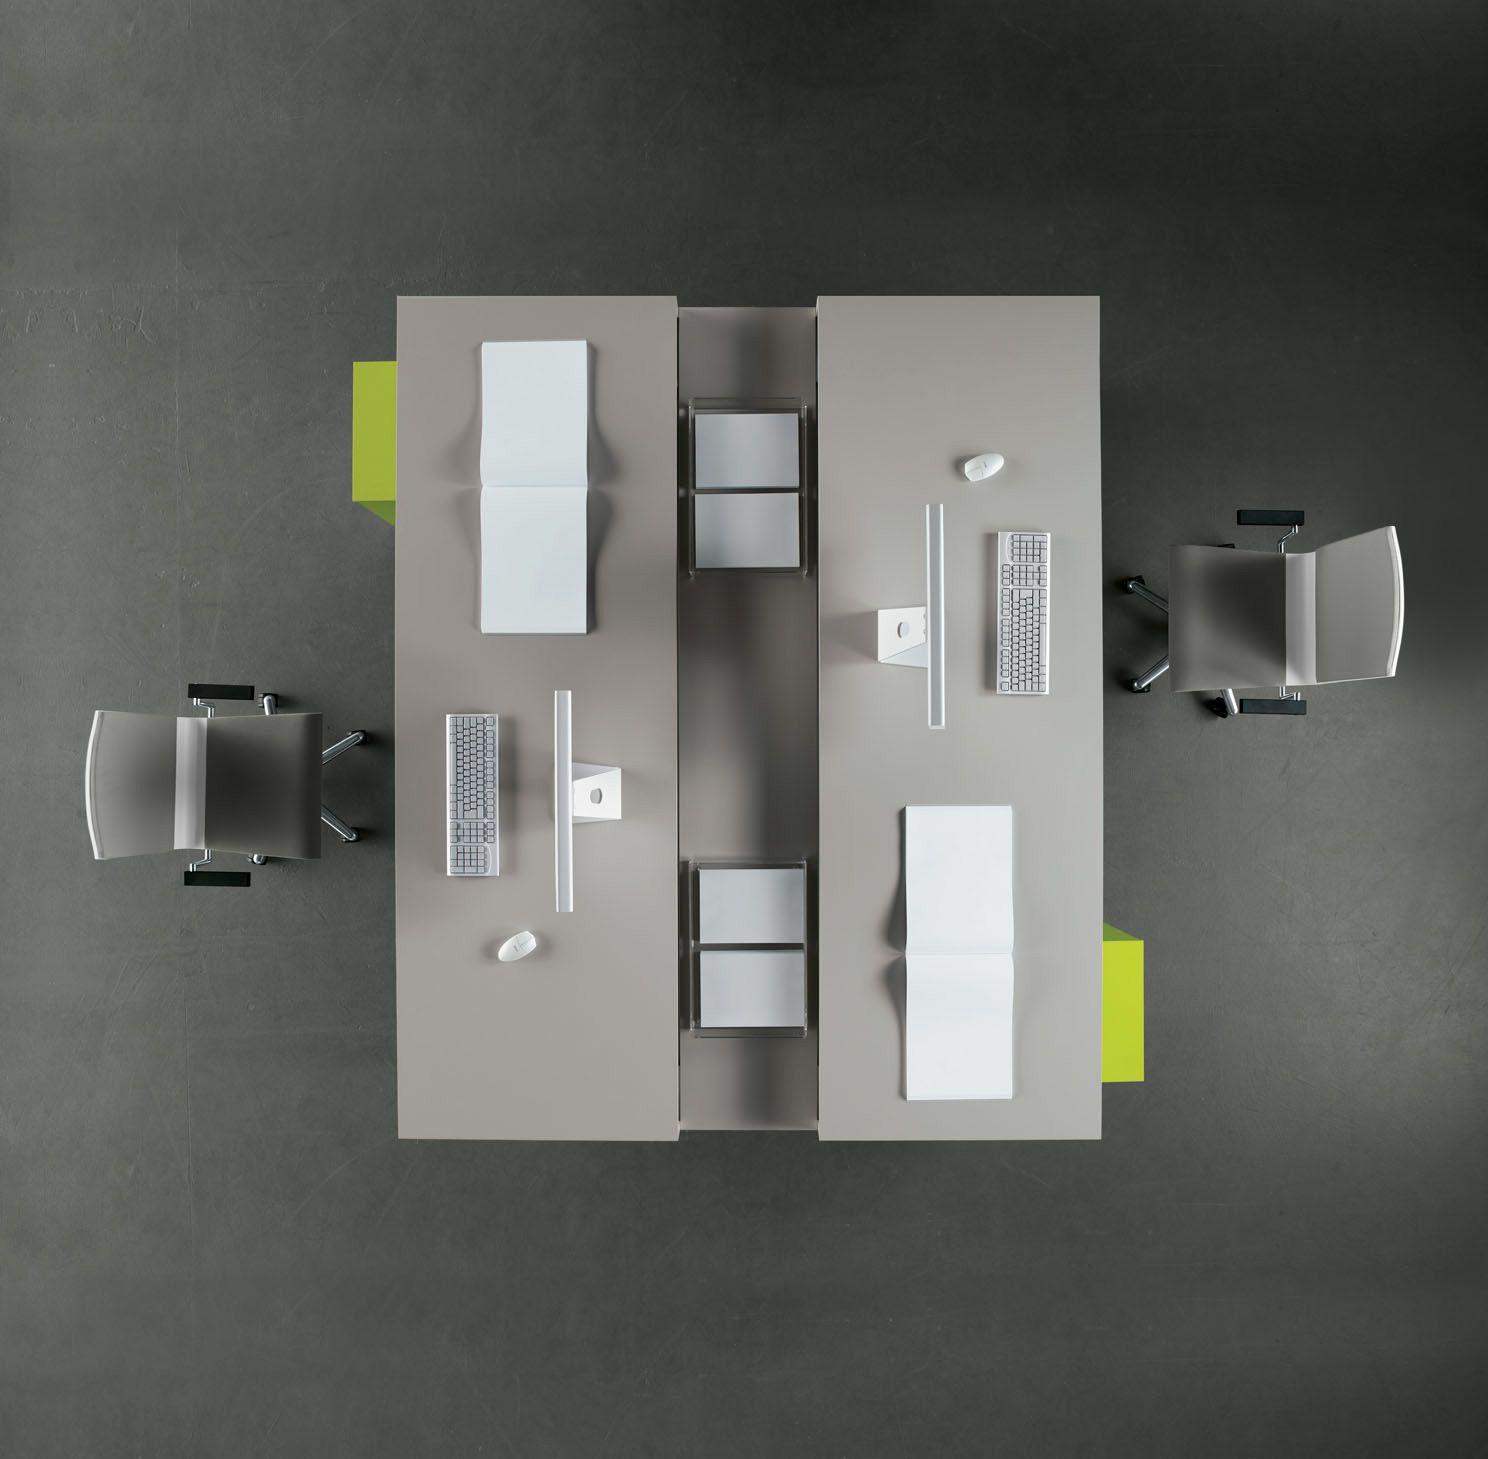 Tre desk top view resources pinterest muebles for Escritorios de oficina